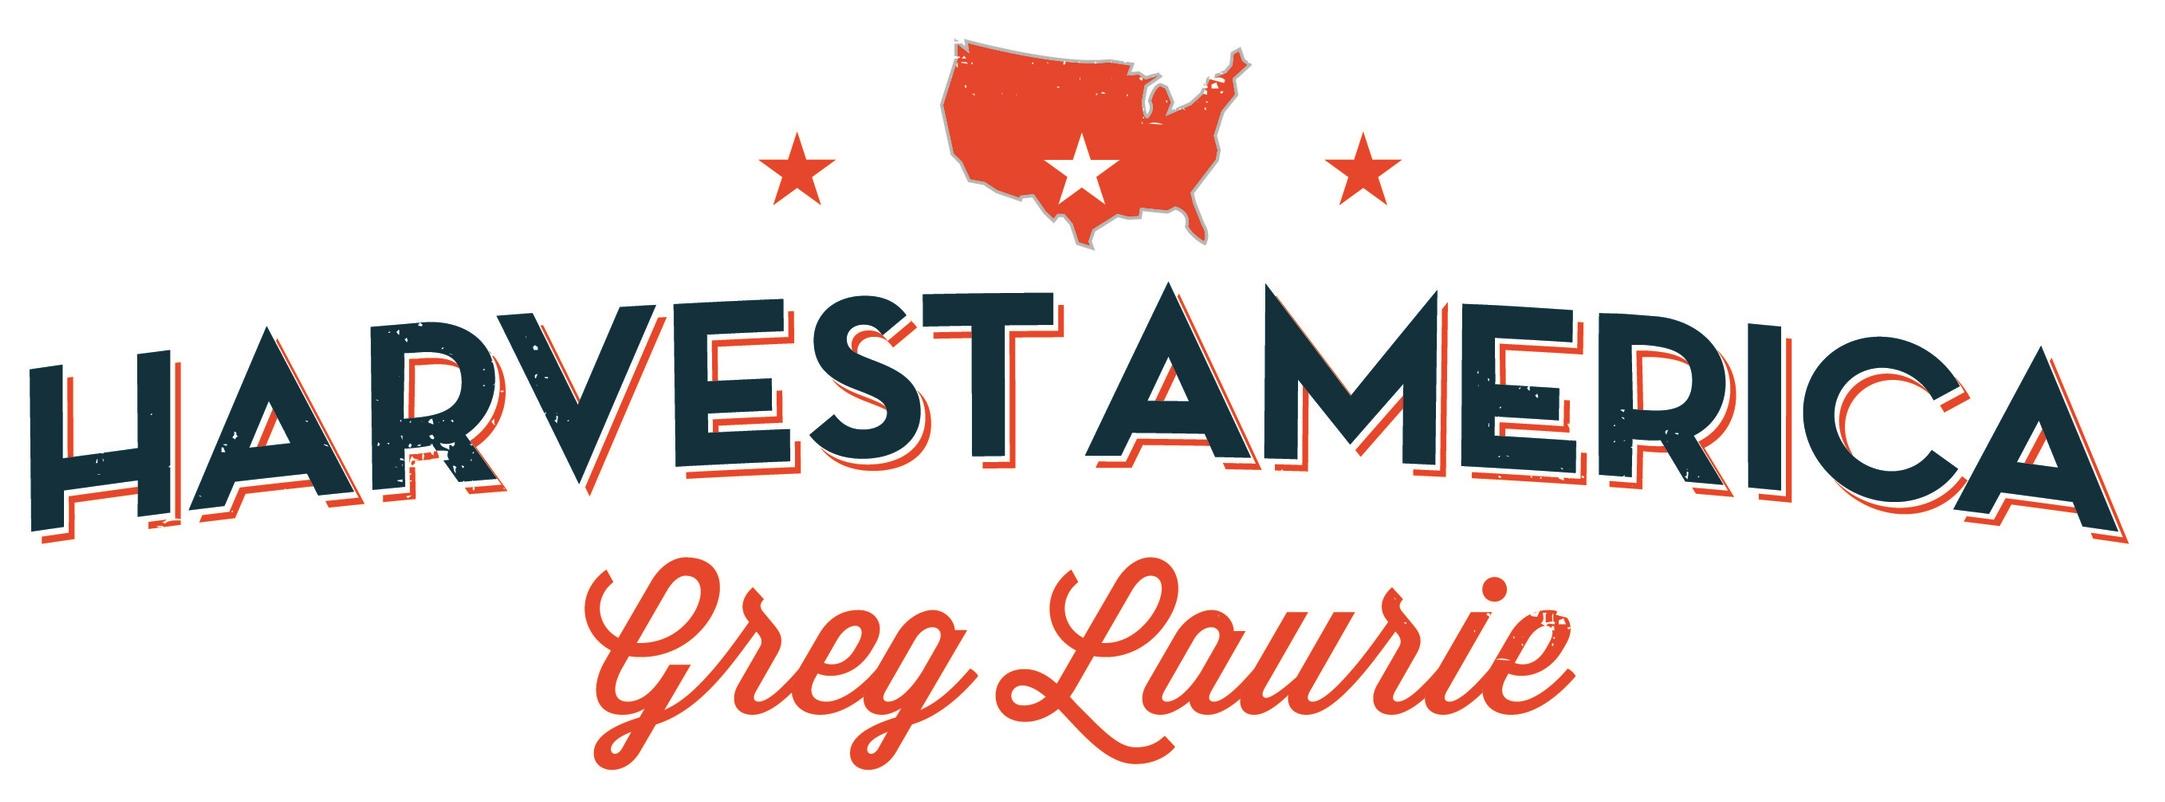 HarvestAmerica_2015_Logo.jpg